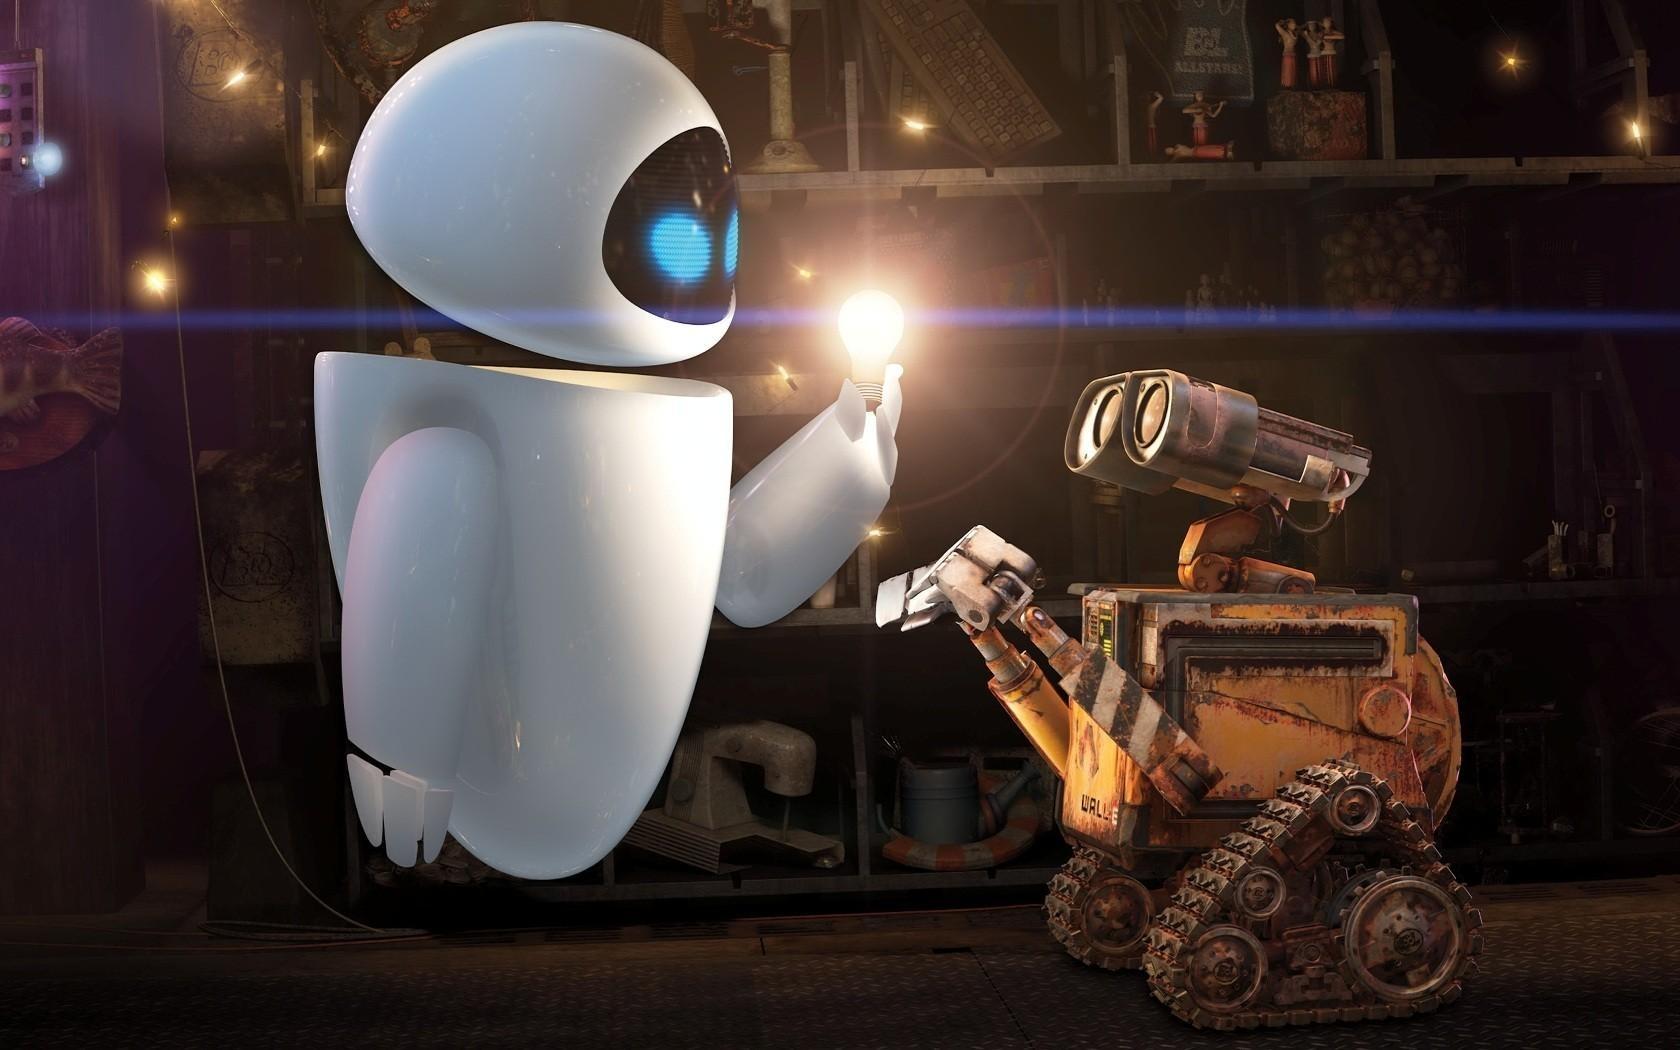 Робот добрый картинка